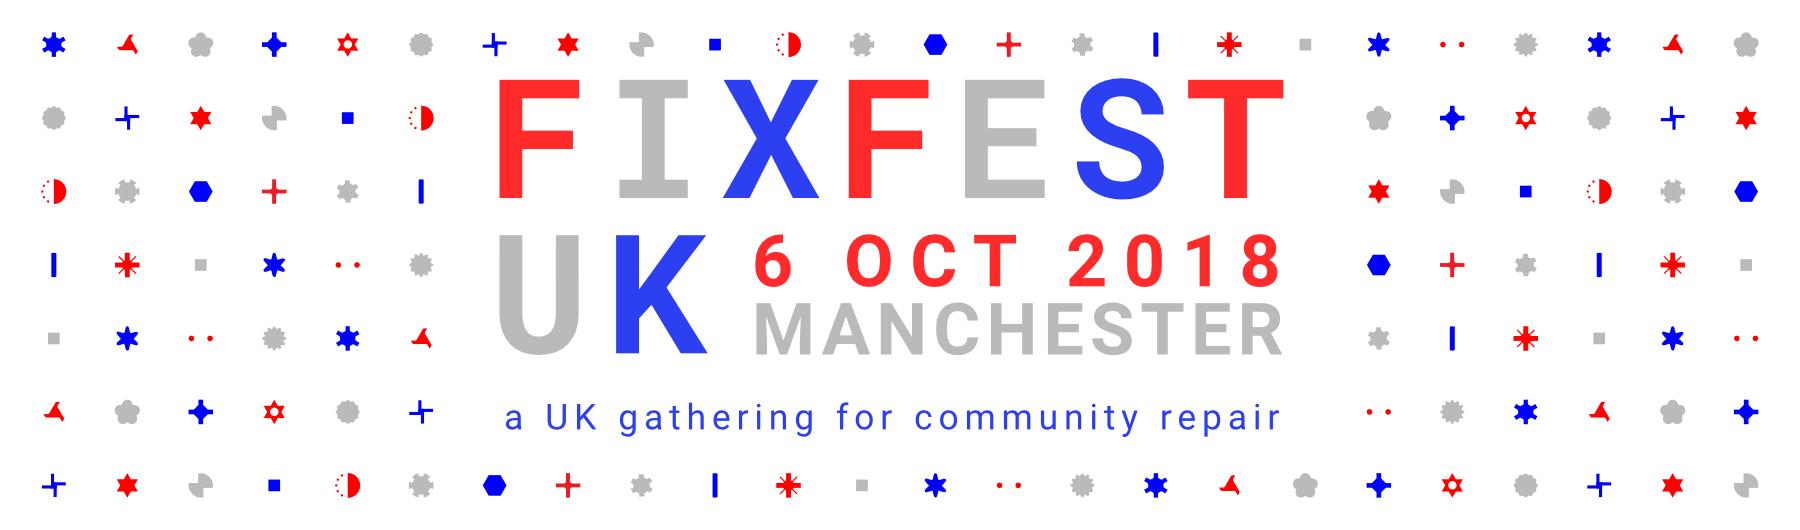 Fixfest UK